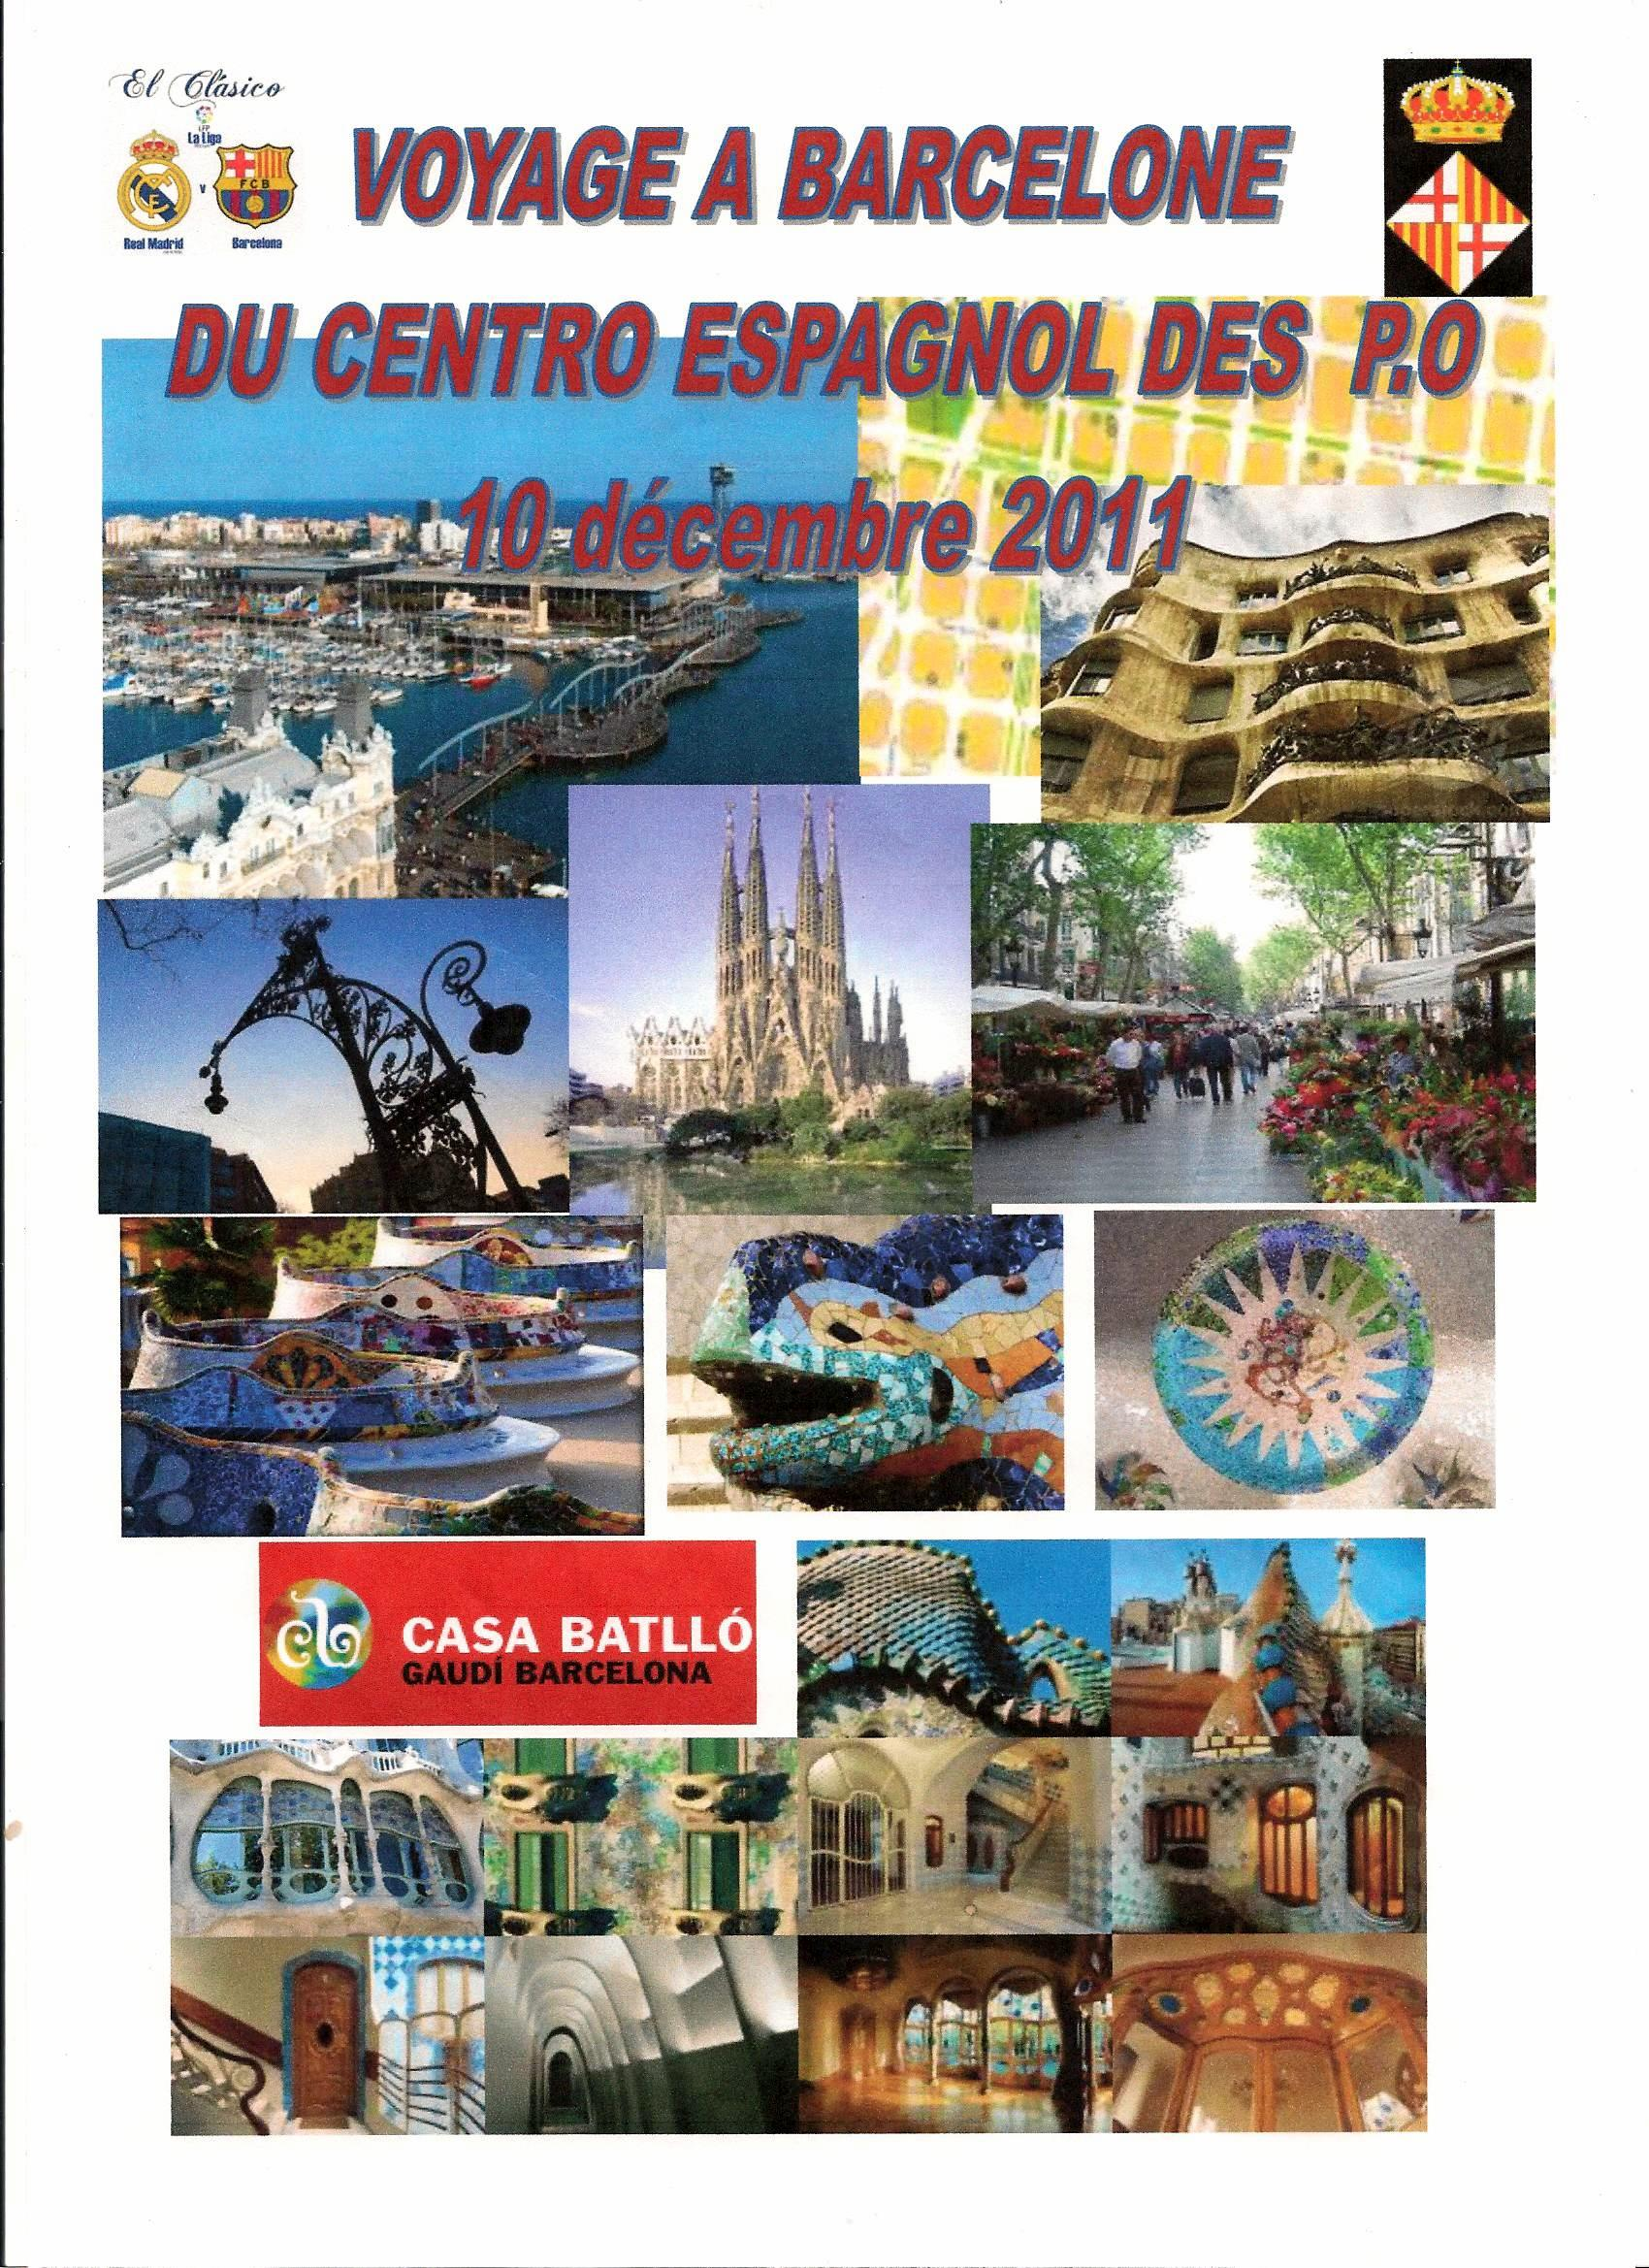 Voyage Barcelone 001